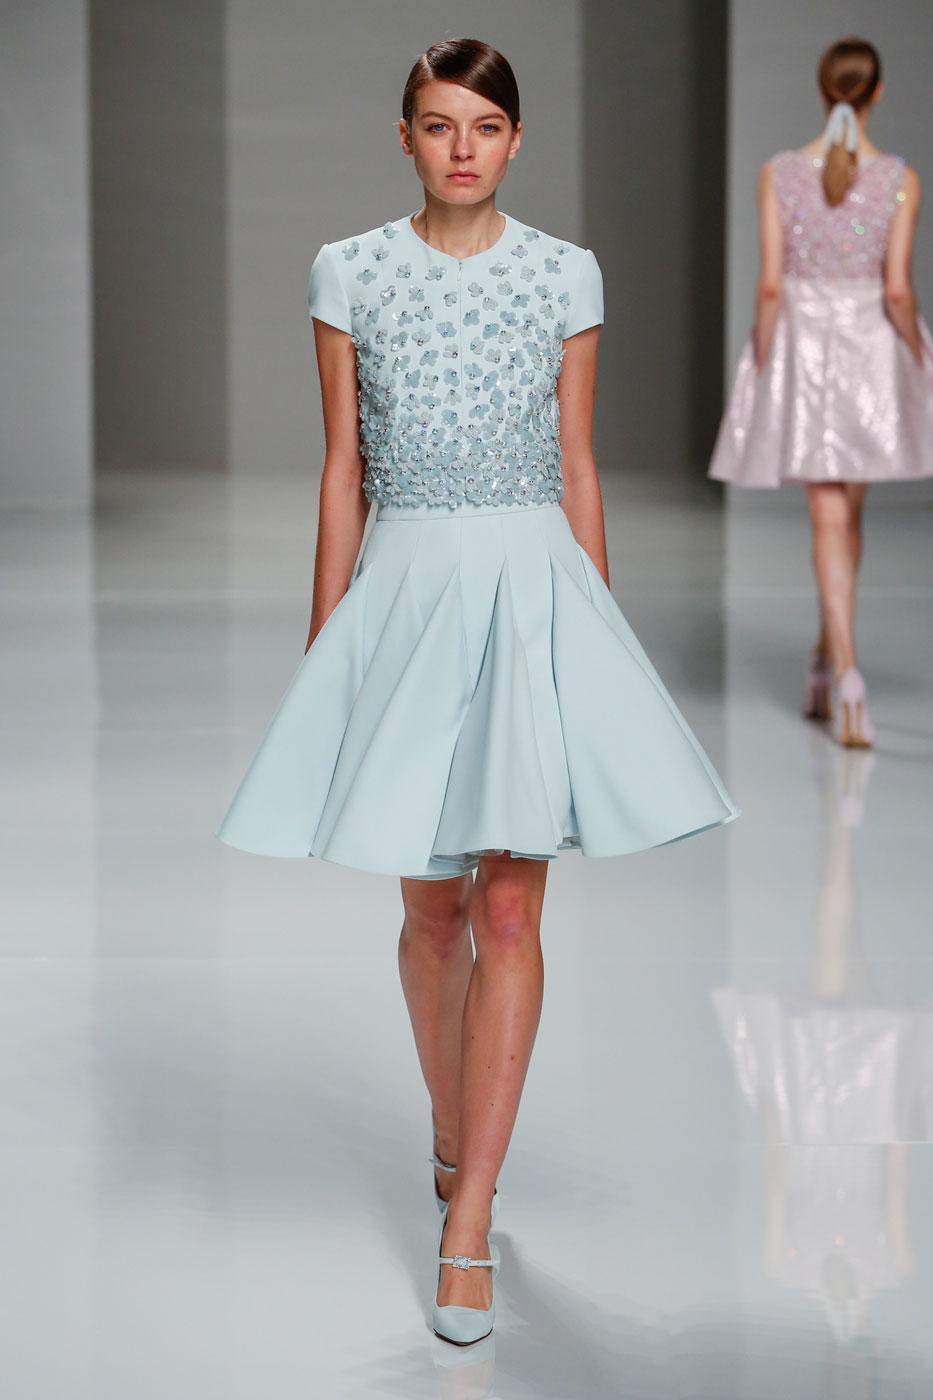 Georges-Hobeika-fashion-runway-show-haute-couture-paris-spring-2015-the-impression-11